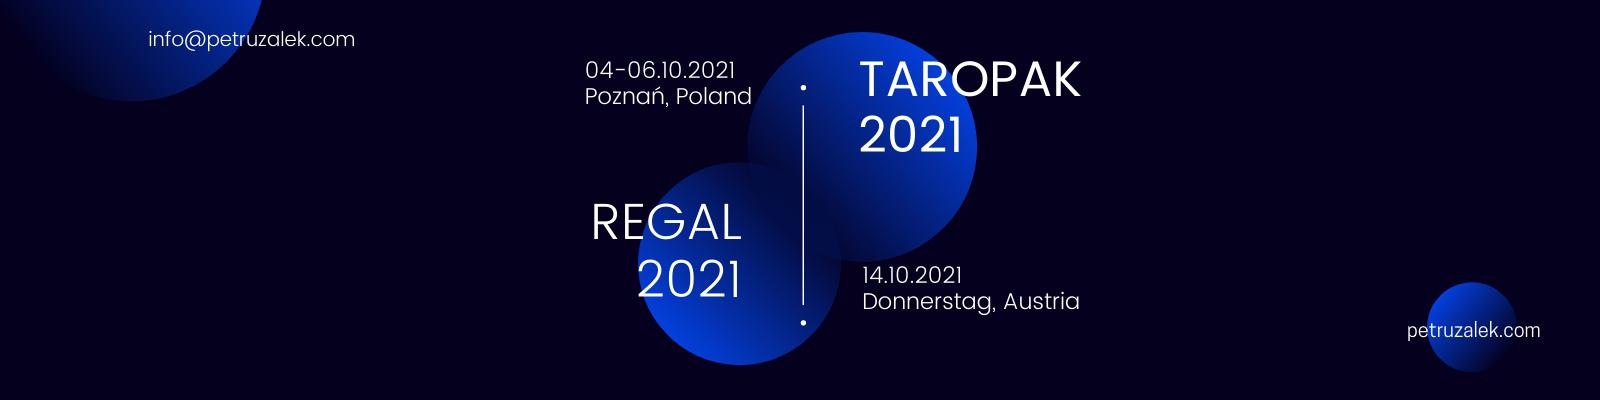 petruzalek-participation-in-the-upcoming-events-taropak-regal-fair